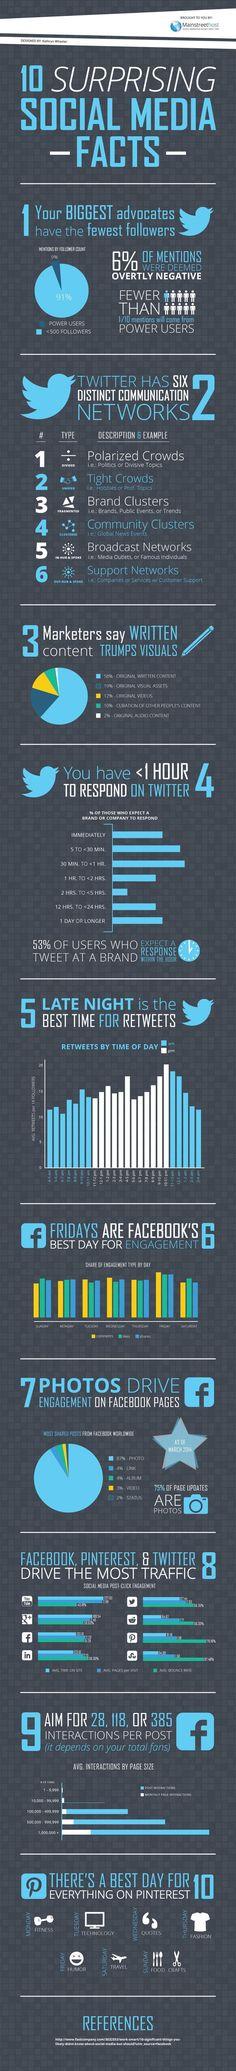 03/2015: 10 Crazy Social Media Facts that Are ACTUALLY True (Even #7) #smm #socialmedia